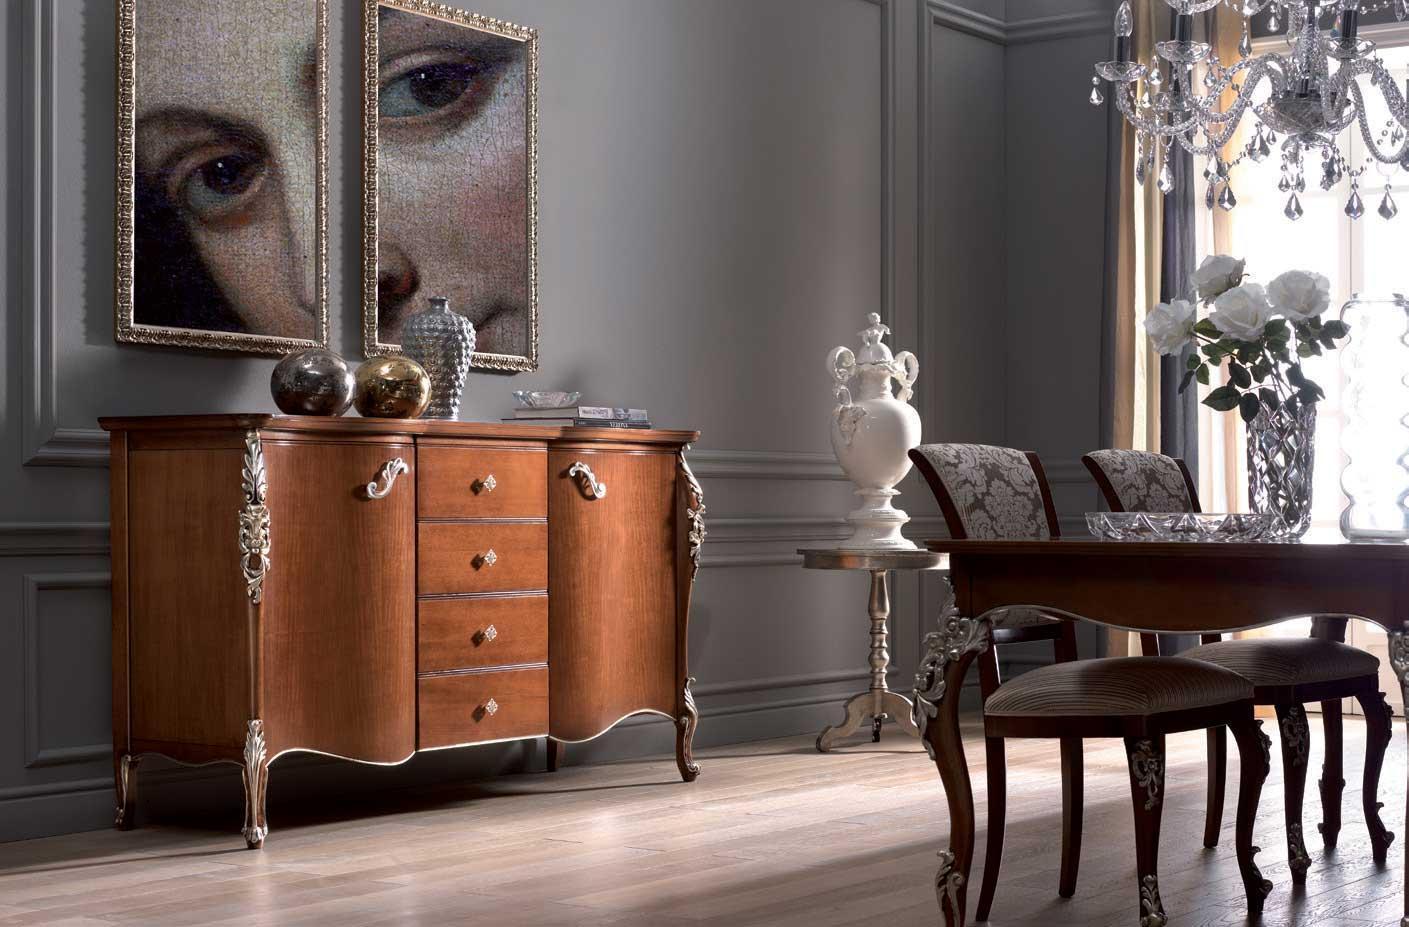 Credenza Camera Da Pranzo : Camera da pranzo classica house venere acquedolci messina